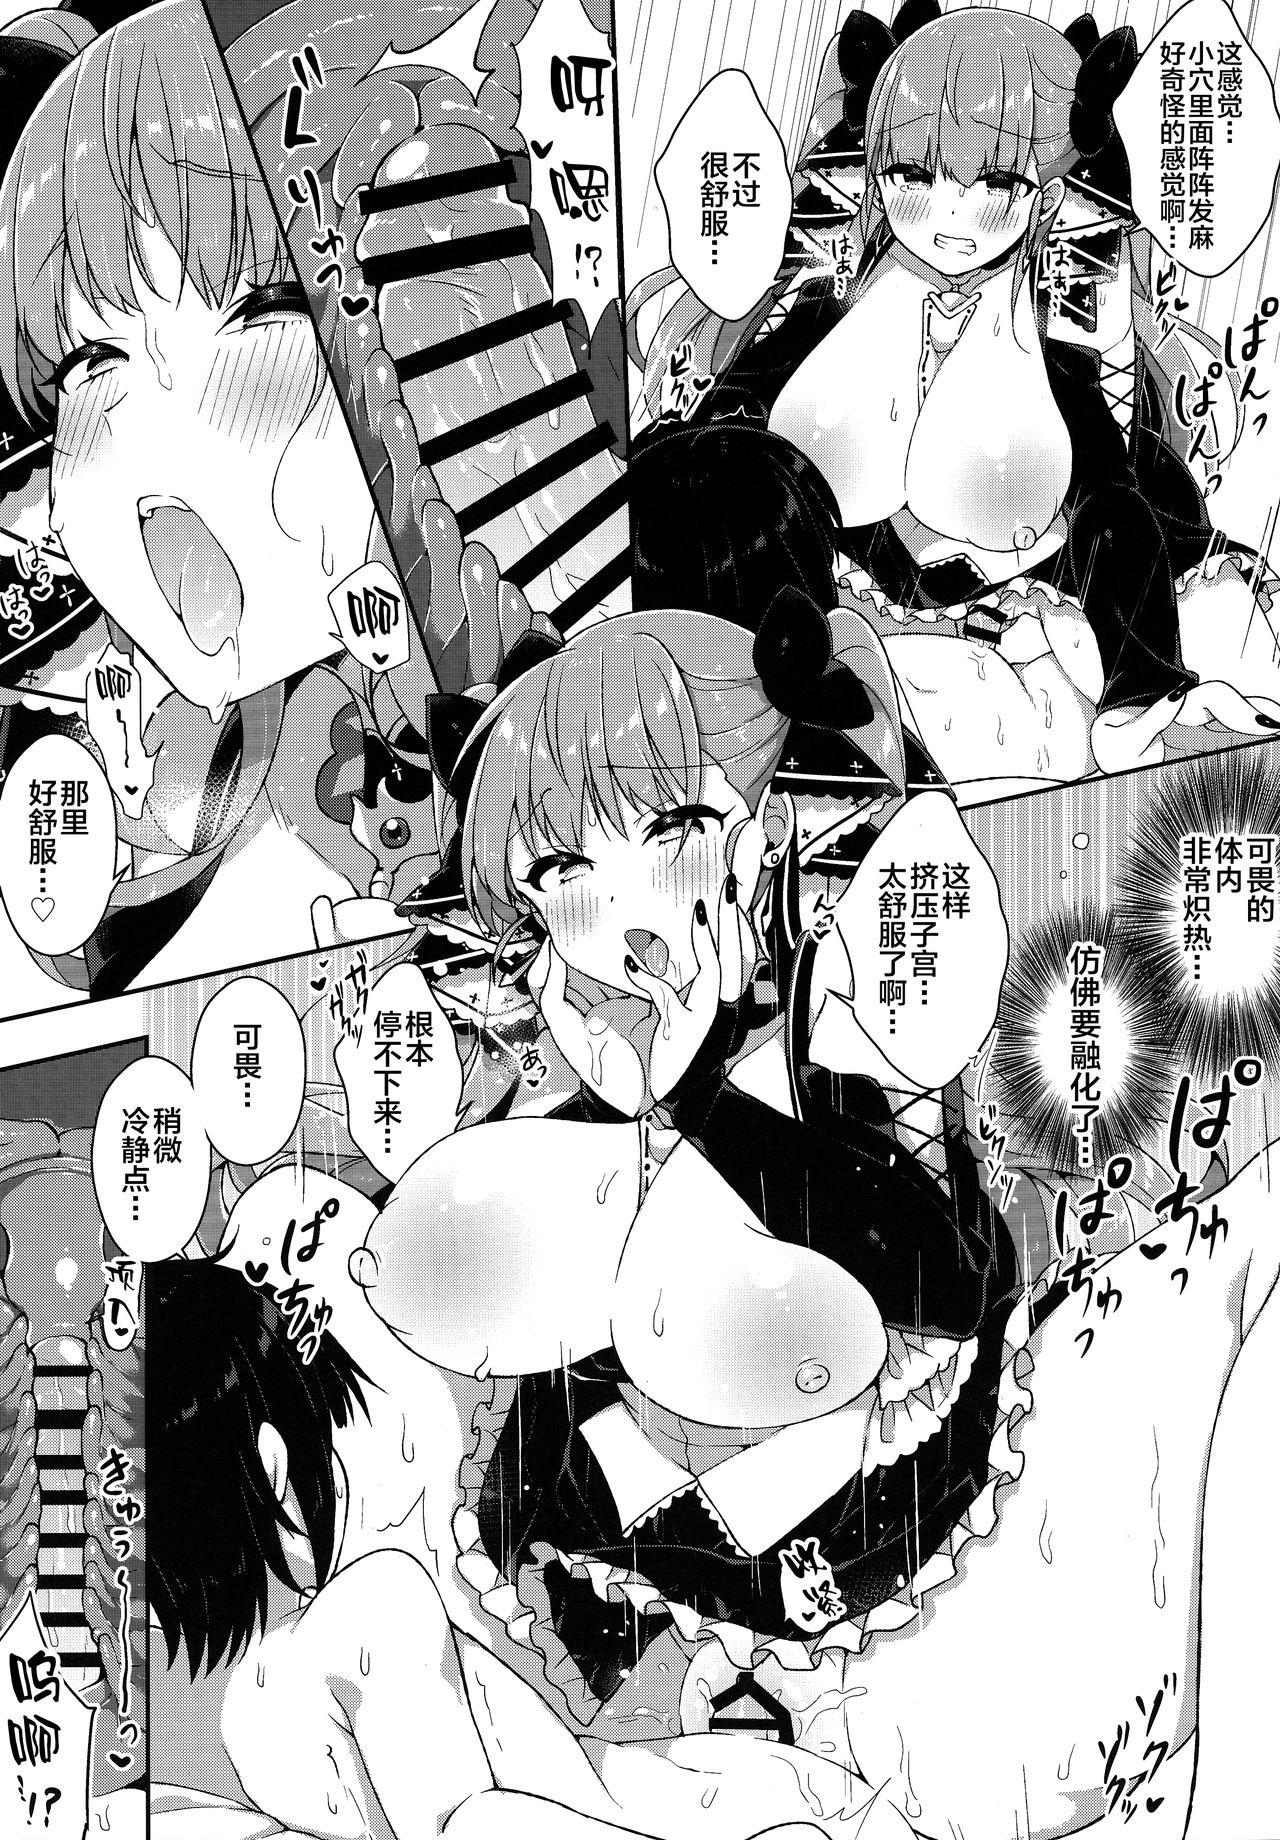 Formidable wa Shikikan de Asobitai - Formidable wants to play a commander 11